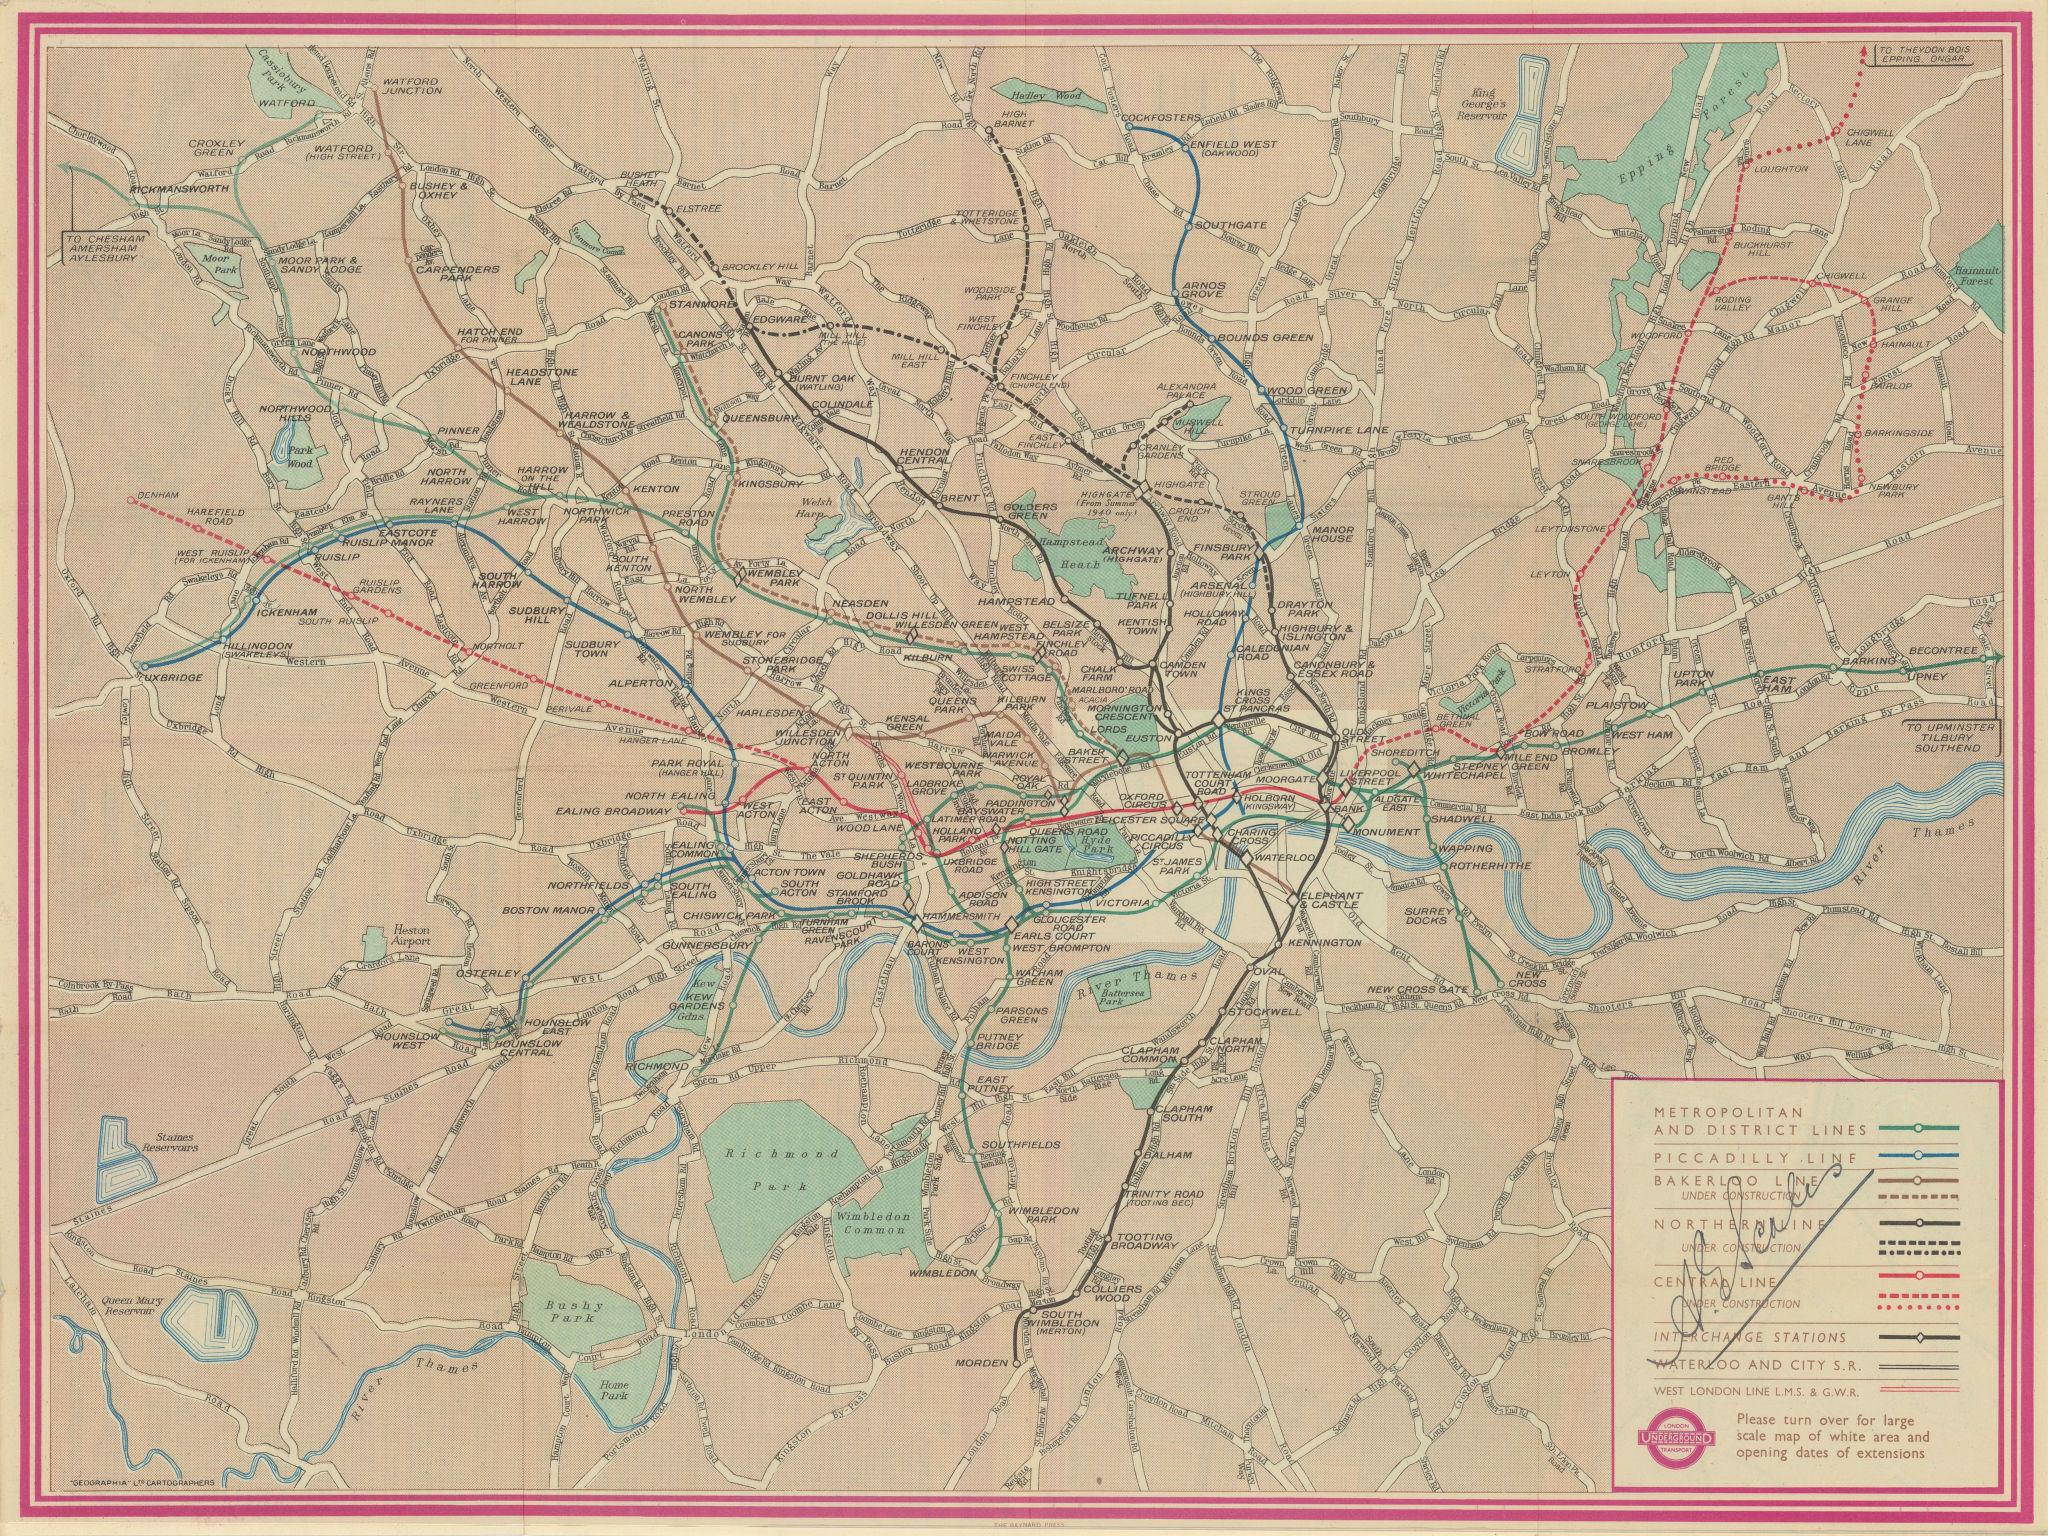 London Transport Underground map #3 1939 old vintage plan chart